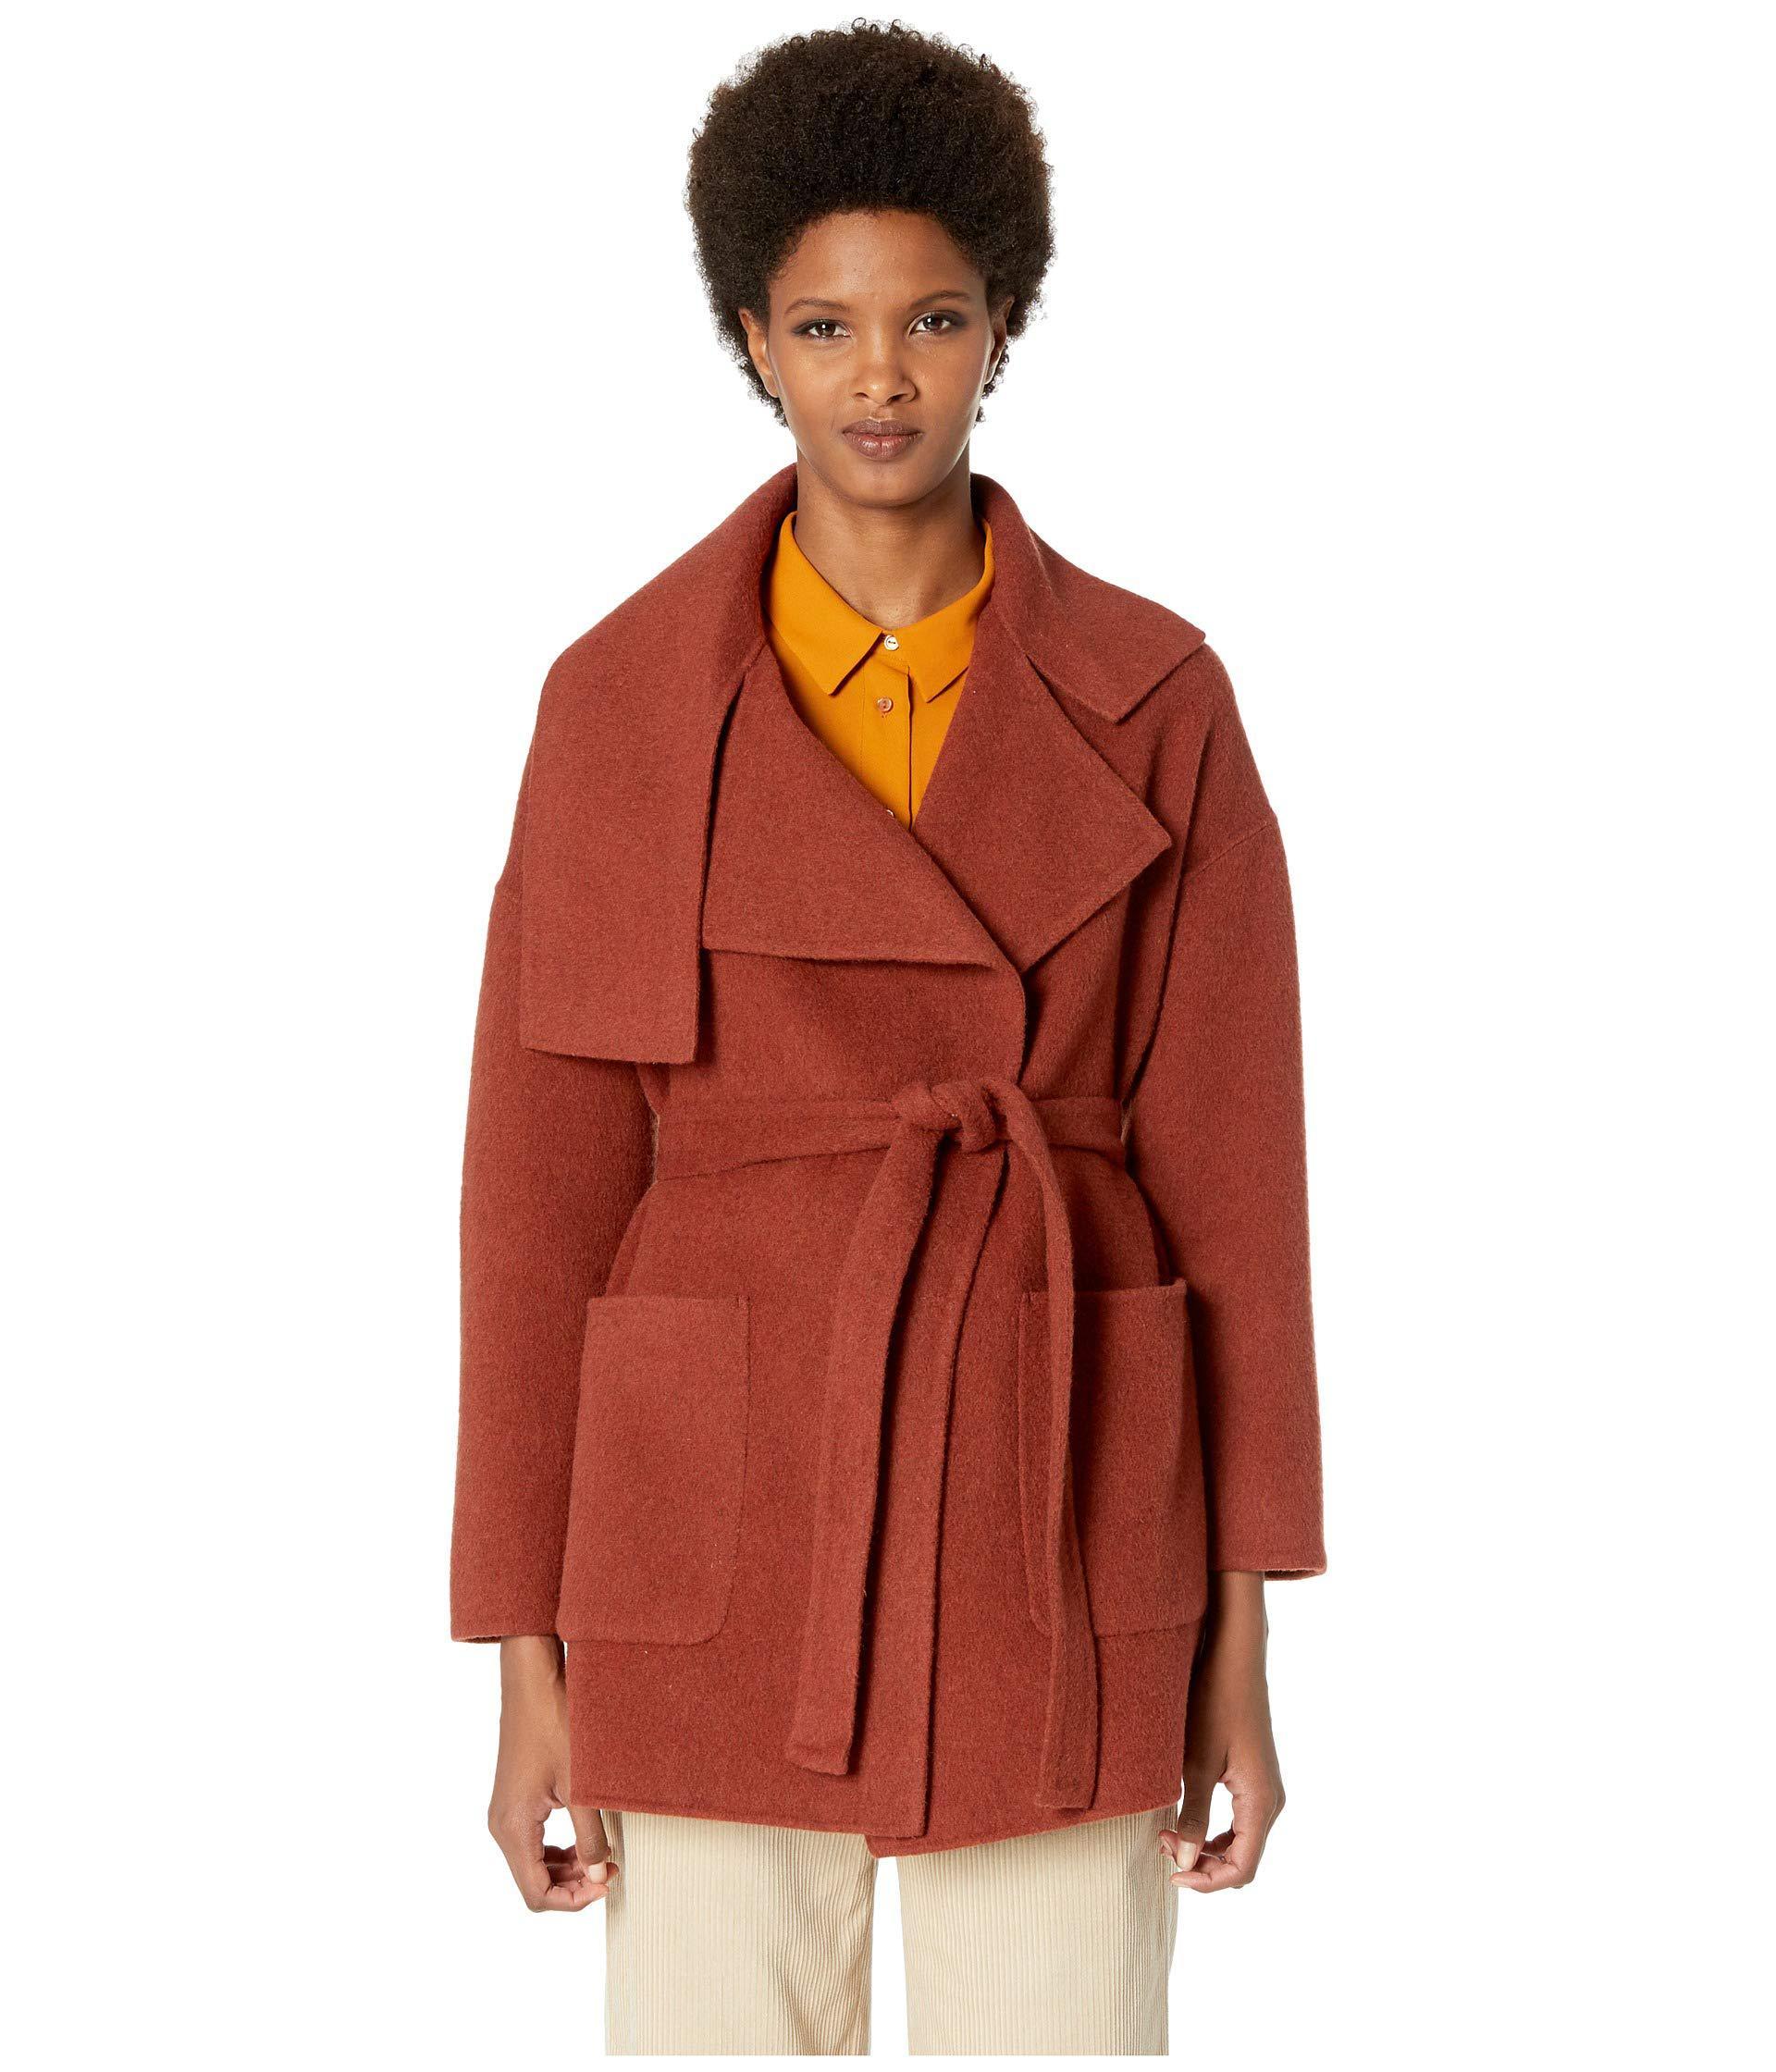 b00b65310de3d Lyst - Vince Blanket Coat (anise Red) Women s Coat in Red